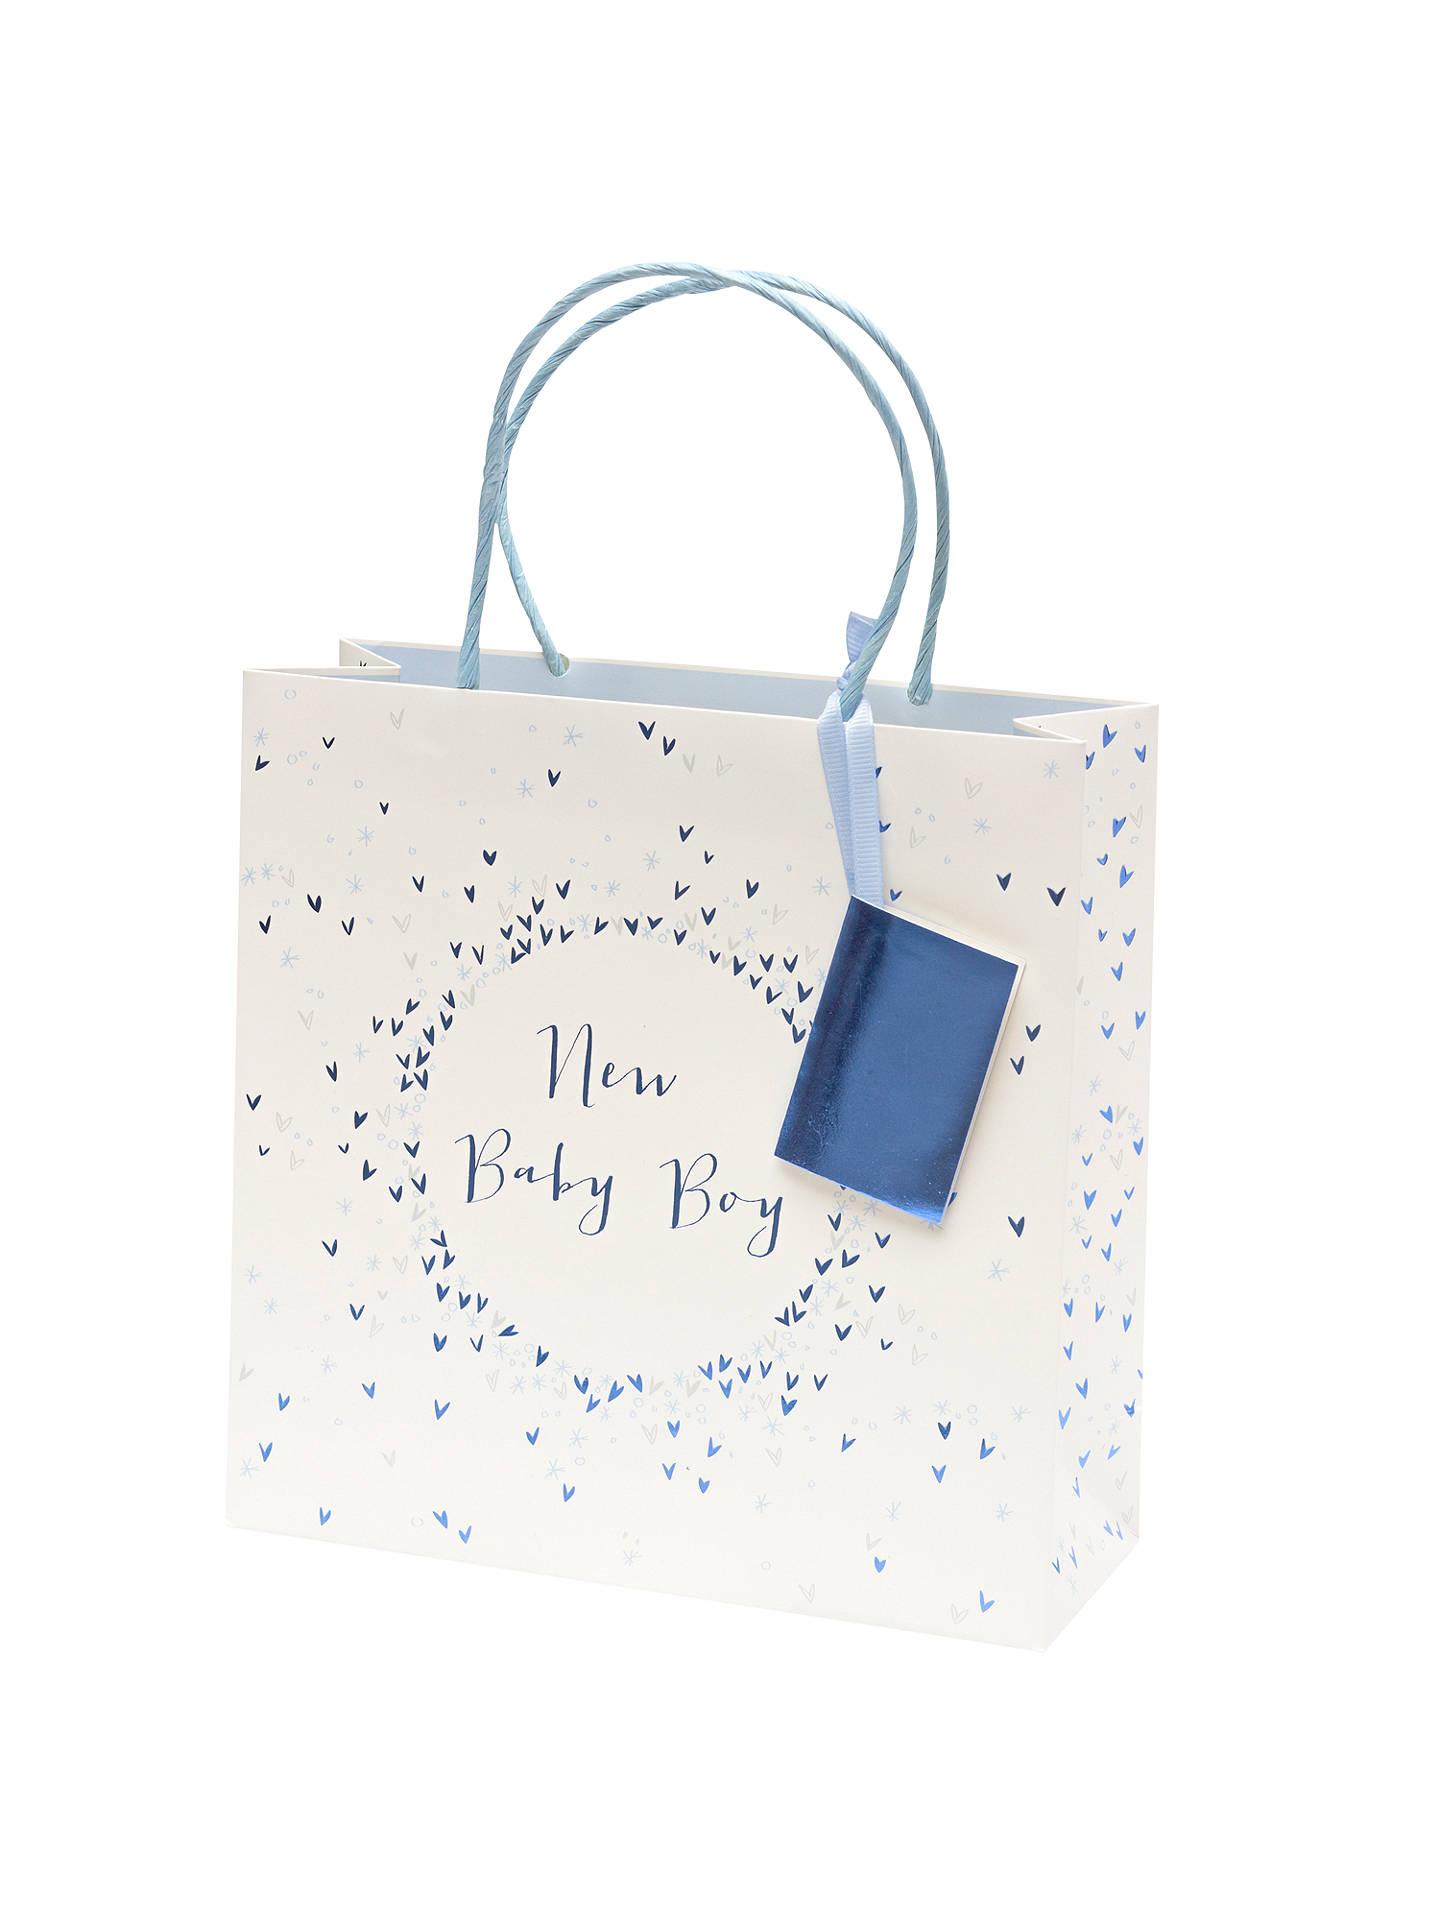 Belly Button Designs New Baby Boy Sprinkles Gift Bag, Medium